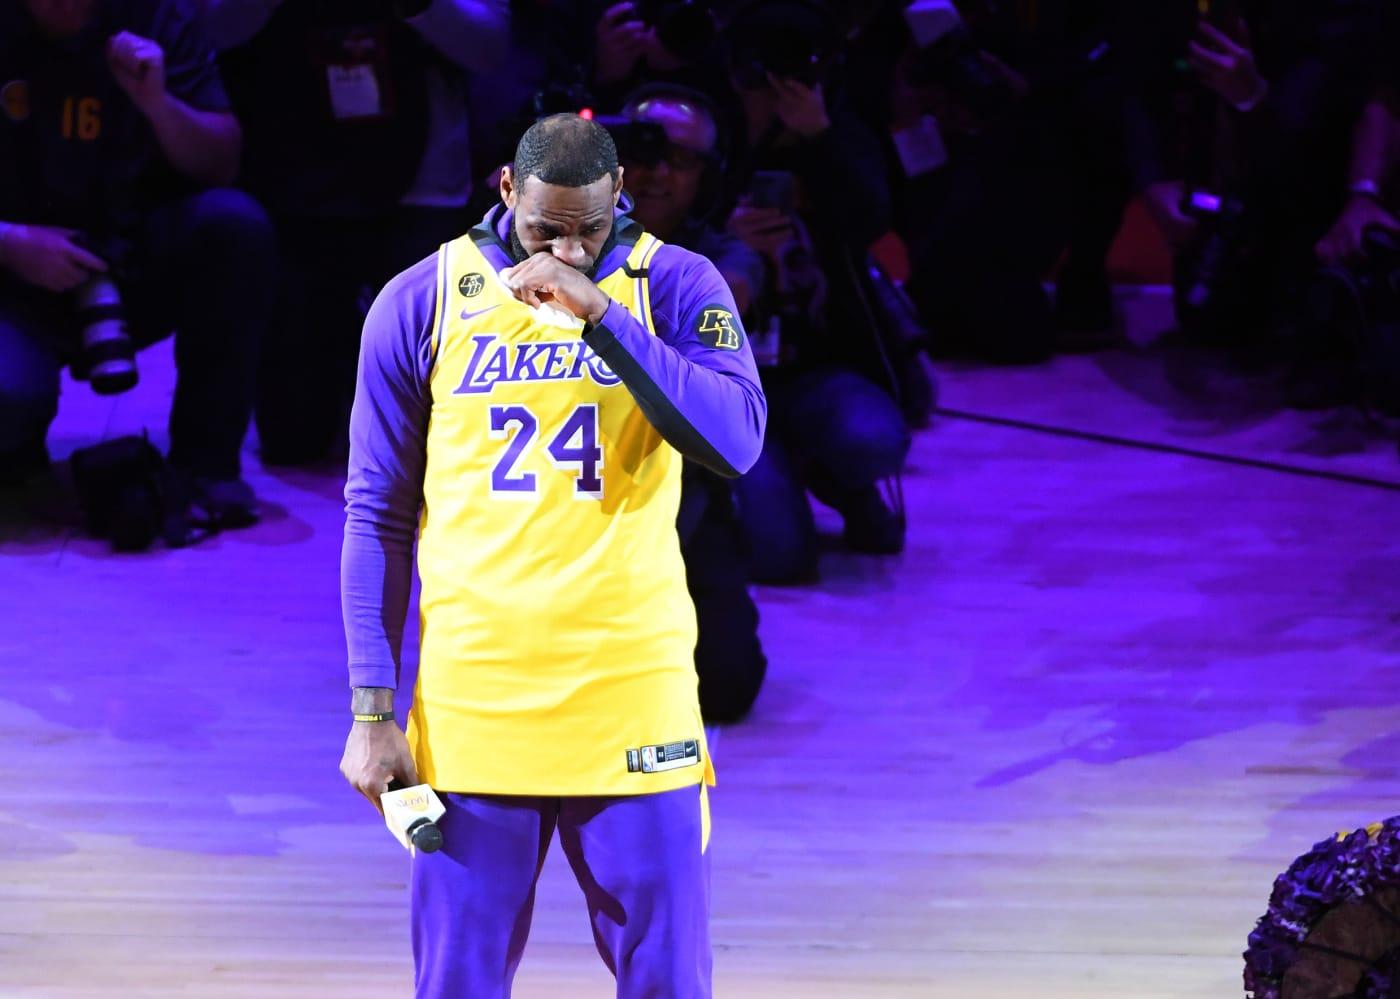 LeBron James Kobe Bryant Tribute Speech Jan 31 2020